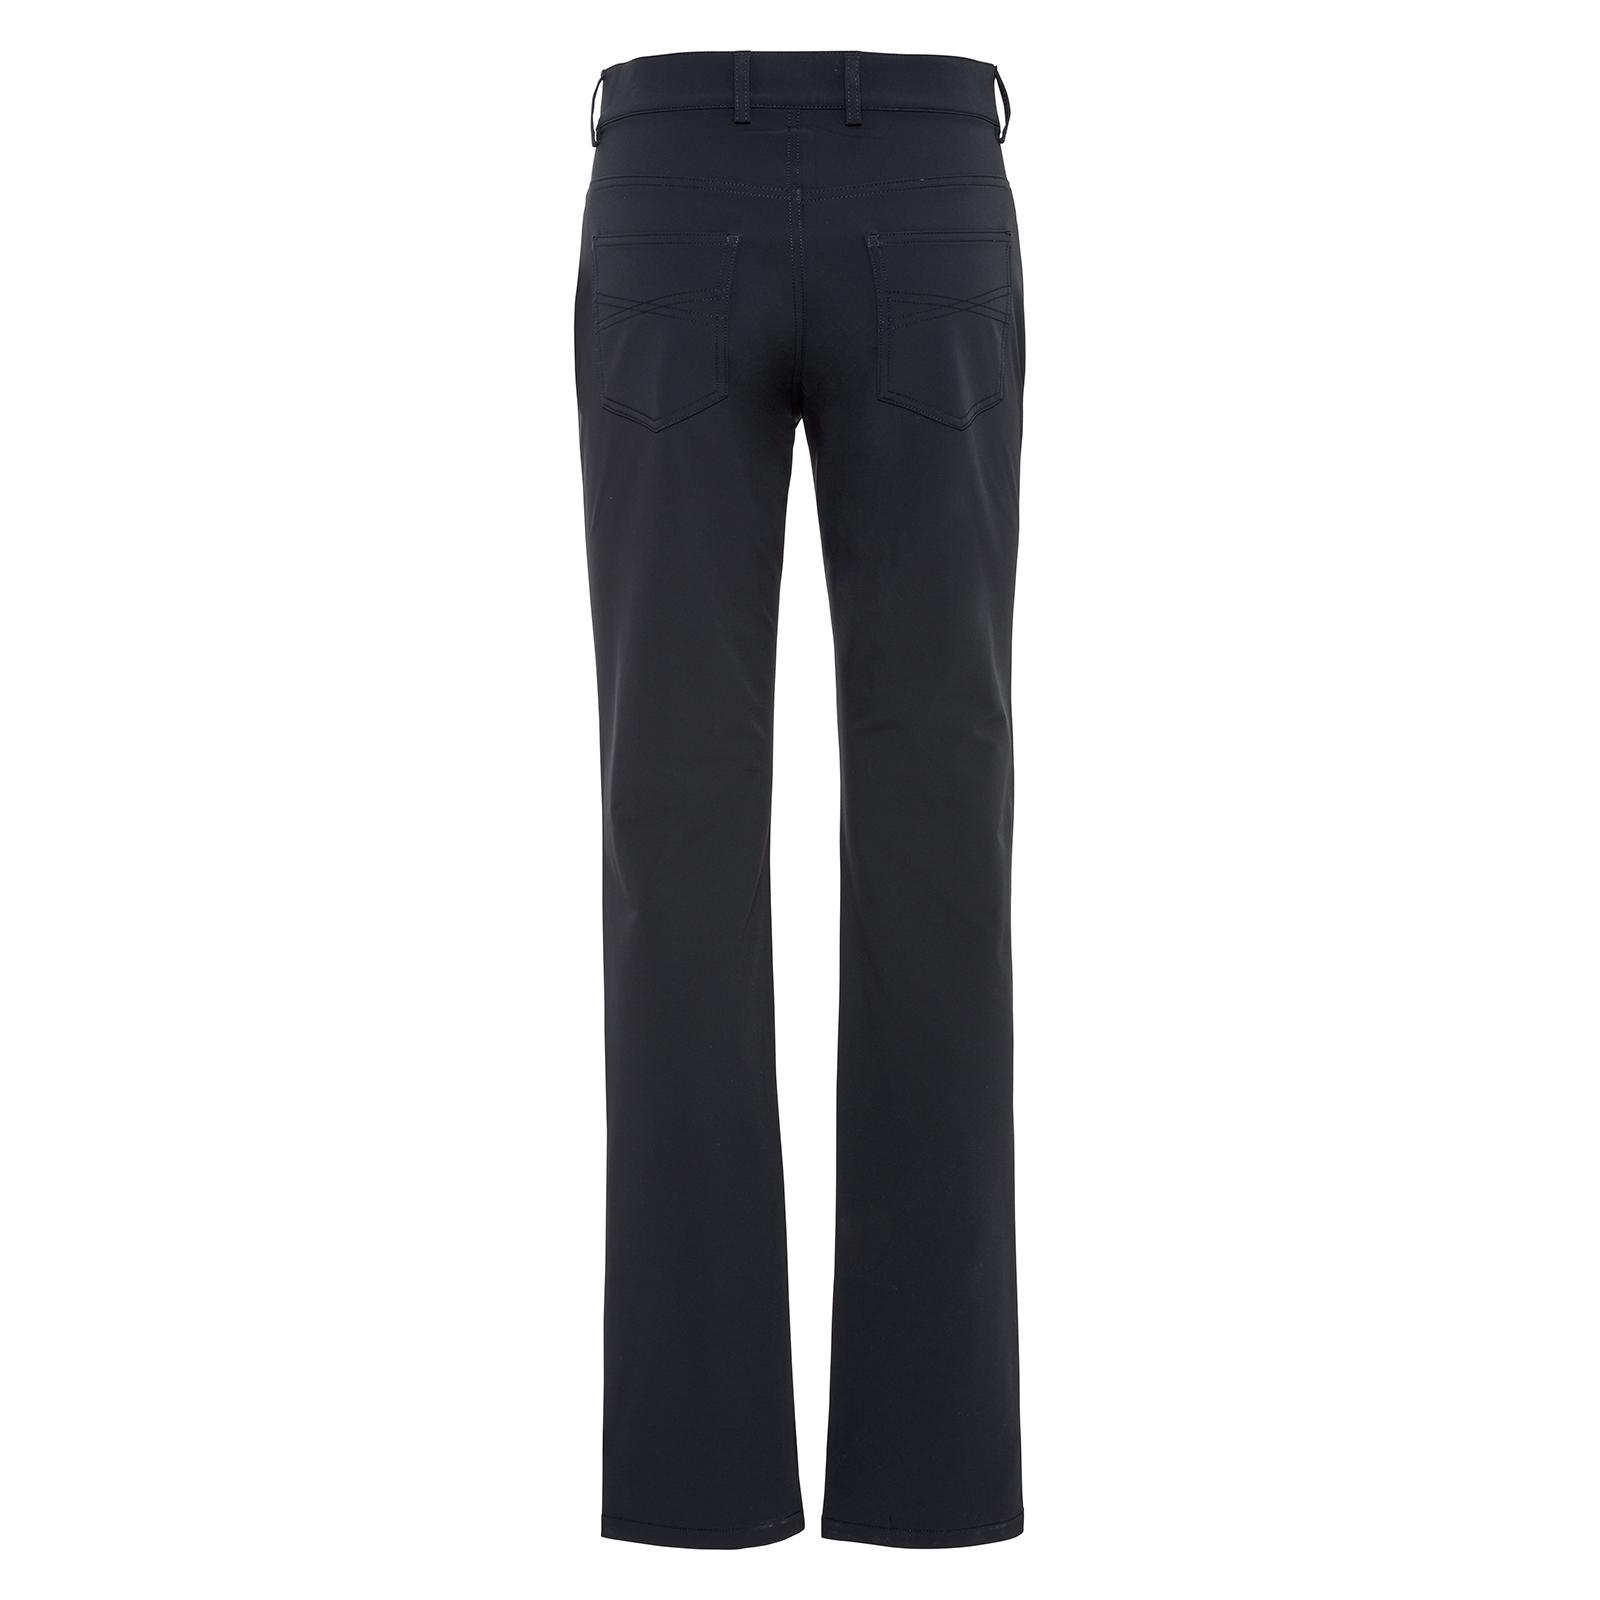 Elastische Damen Hose im Slim Fit